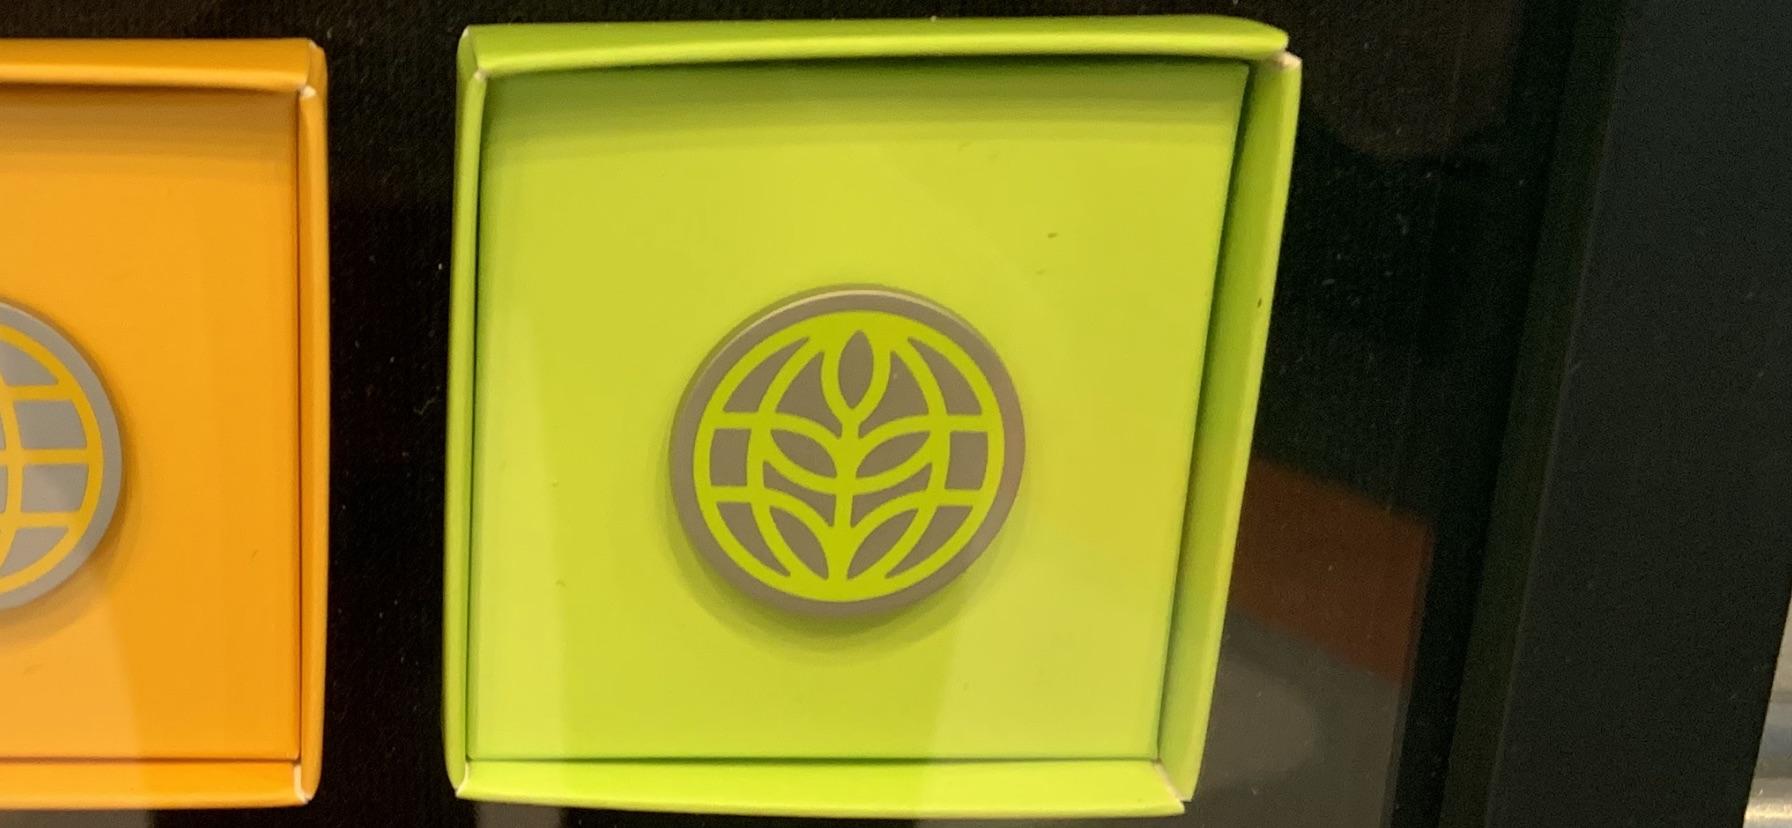 EPCOT pavilion logo pins 12/23/19 21